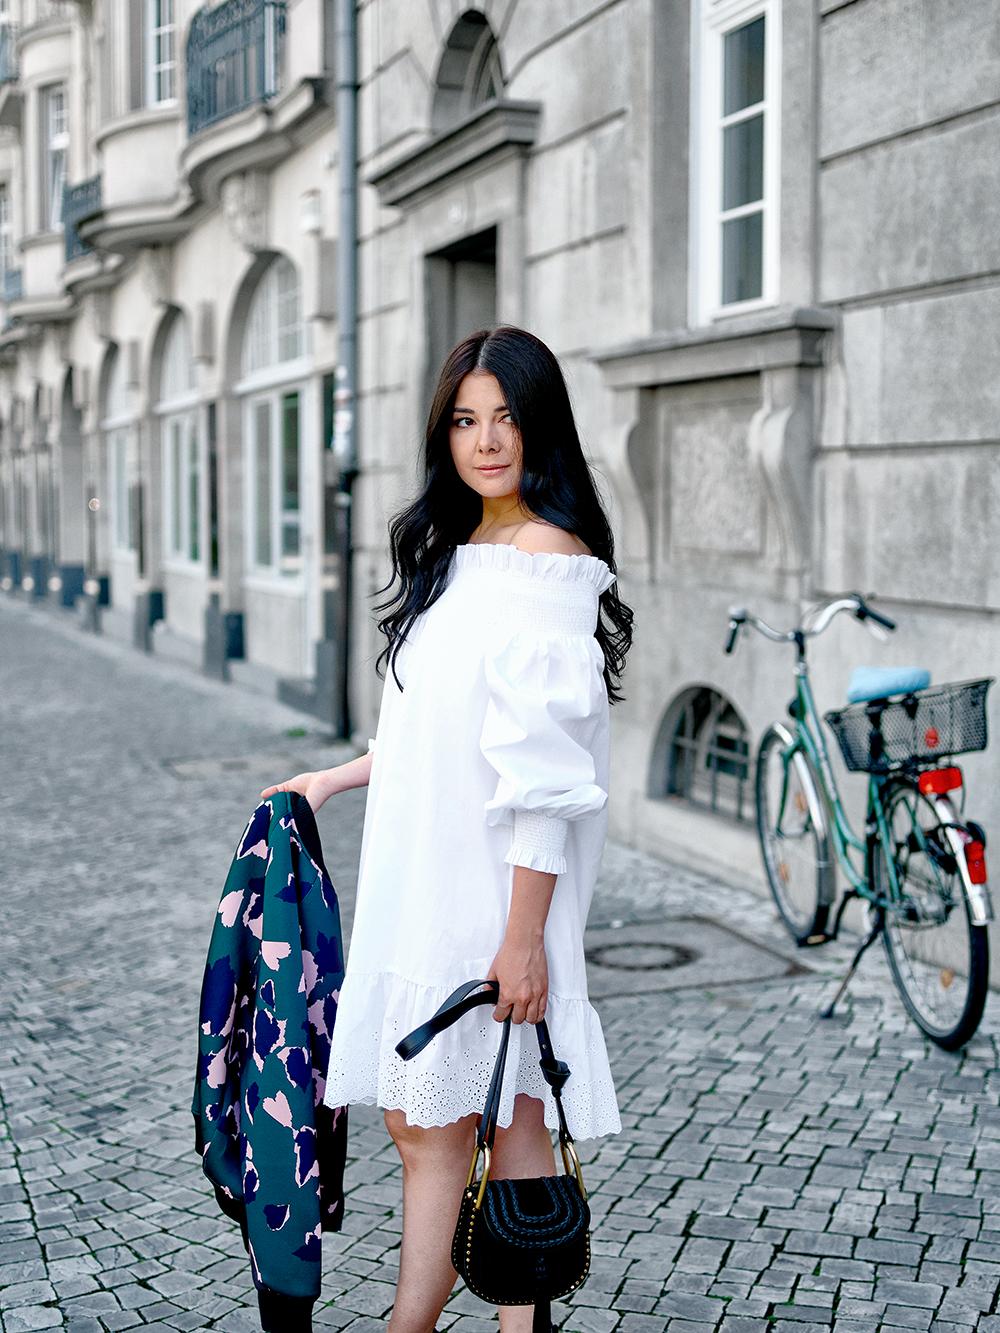 fashionambit-fashionblog-muenchen-modeblog-deutschland-blogger-modeblogger-fashionblogger-bloggerdeutschland-lifestyleblog-munich-style-blog-sommer